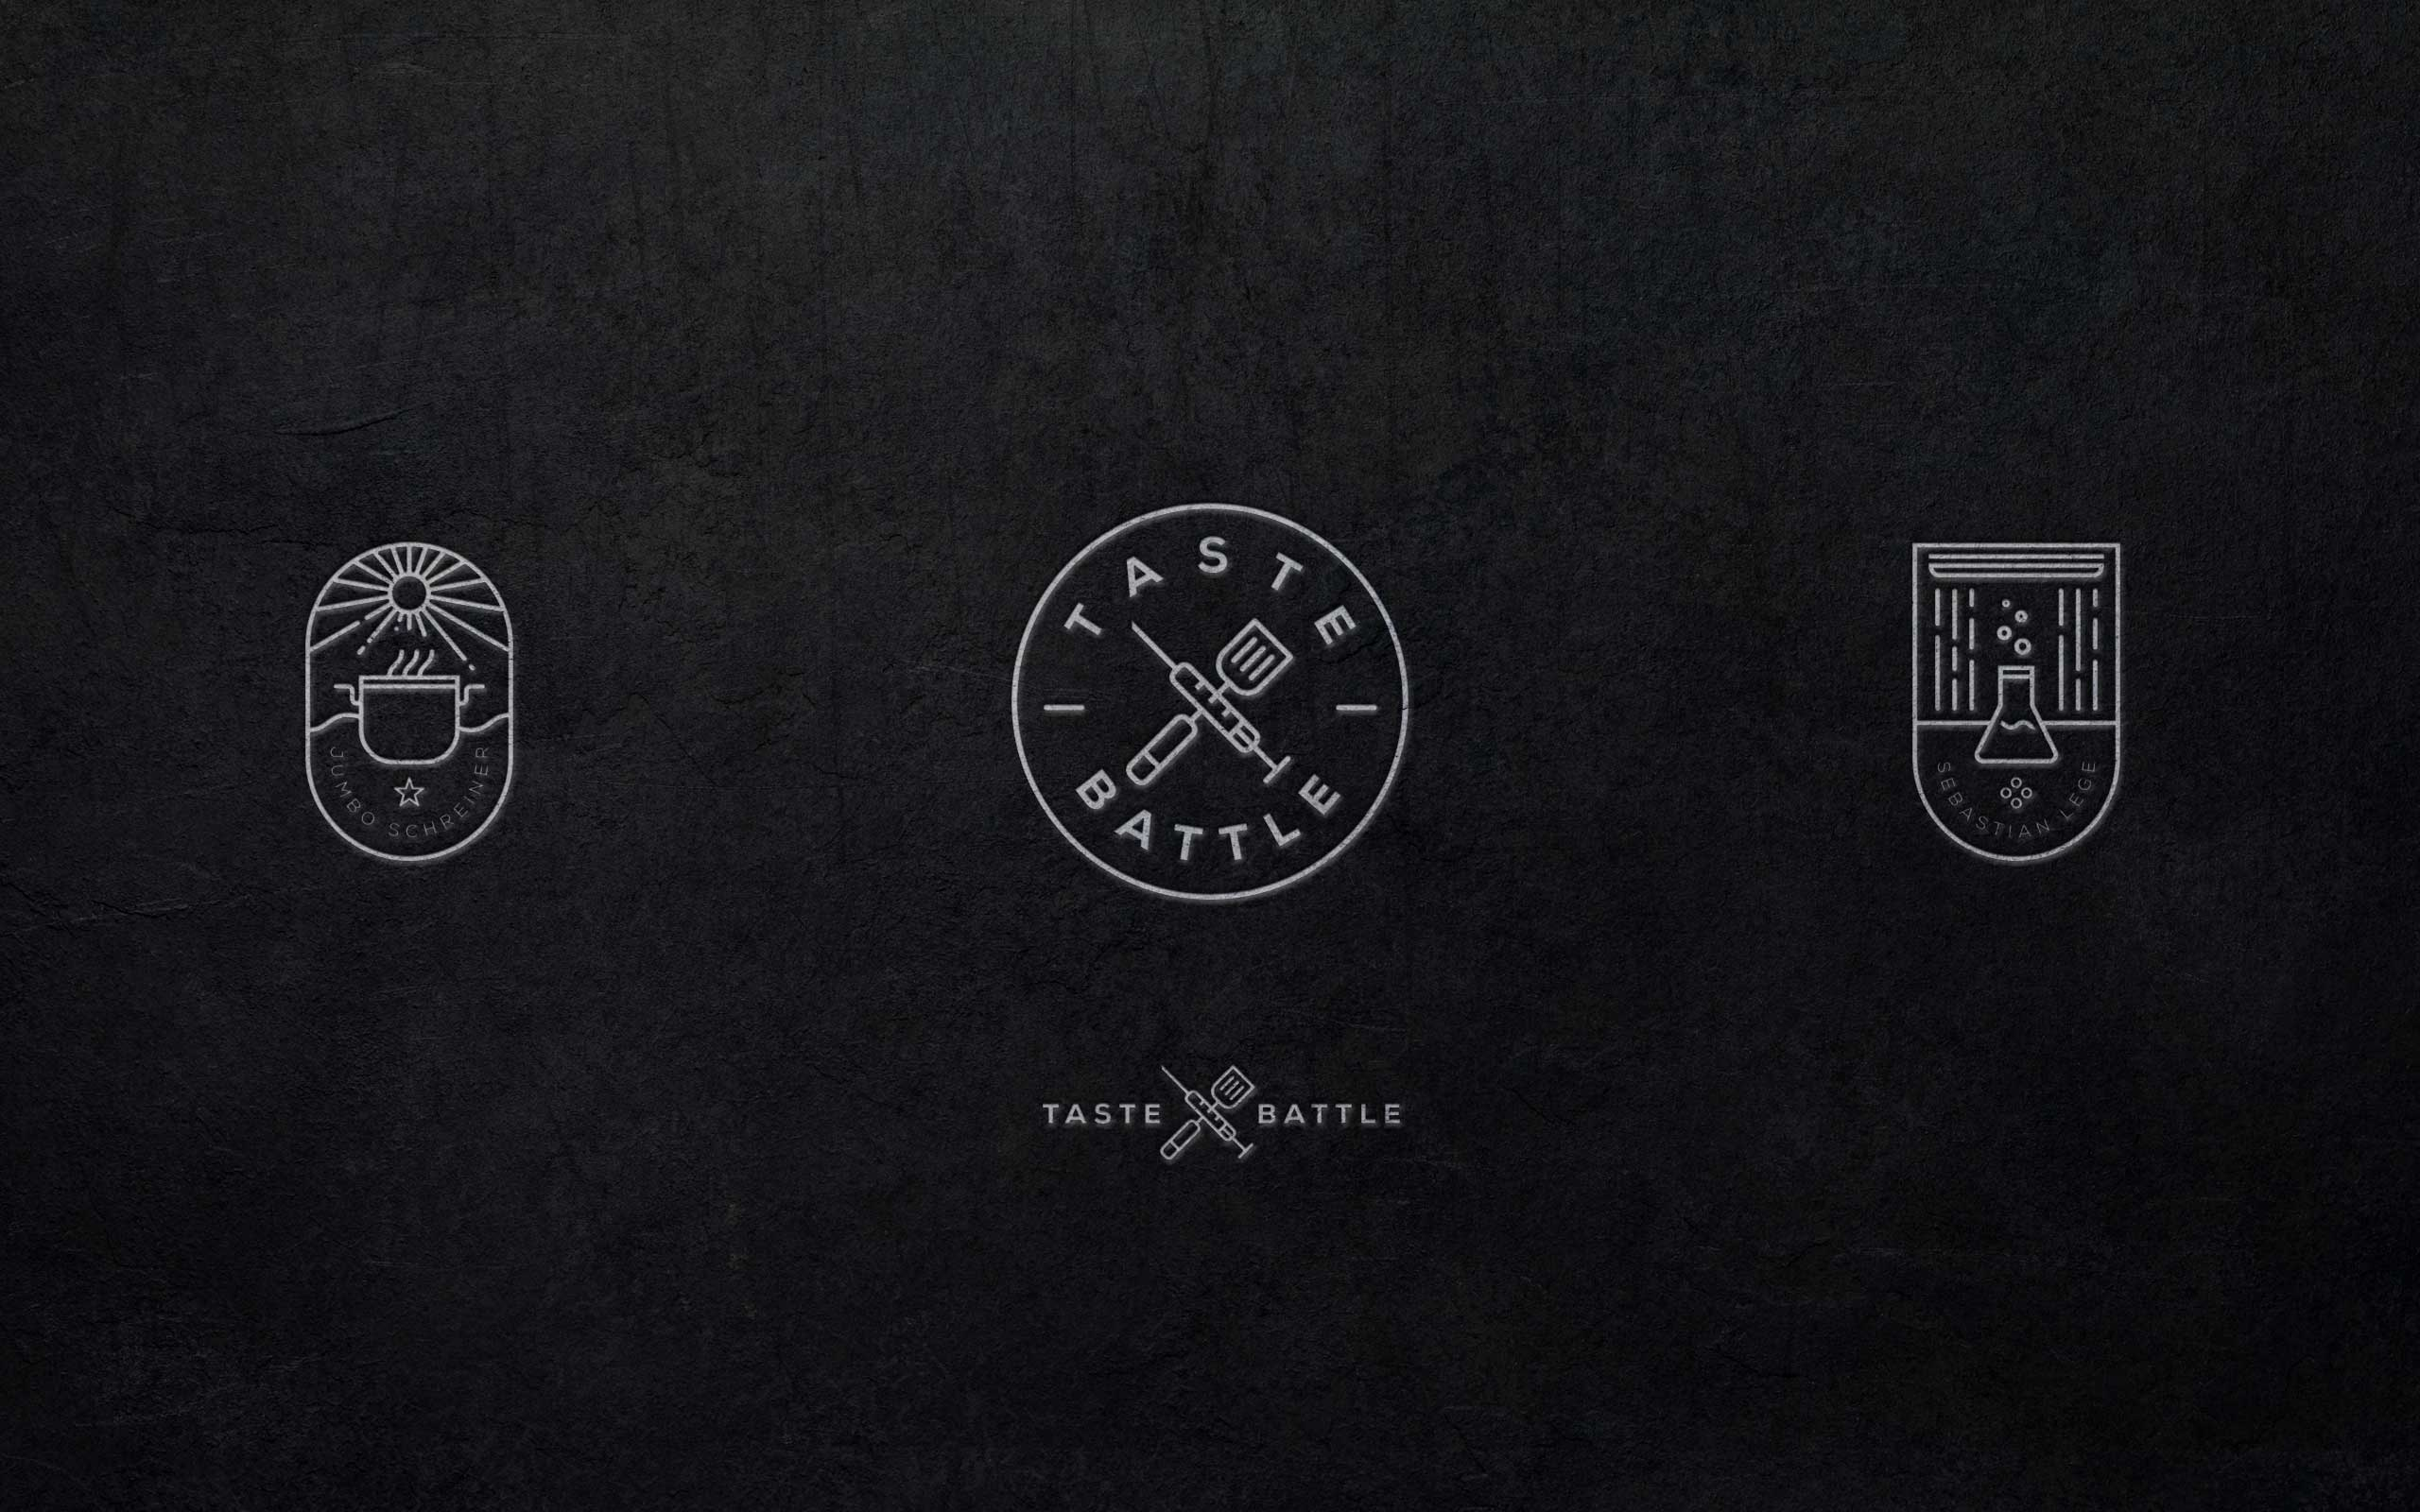 AIM-Studio-Christian-Dueckminor-ProSieben-Taste-Battle-Formatverpackung-Logo-Full